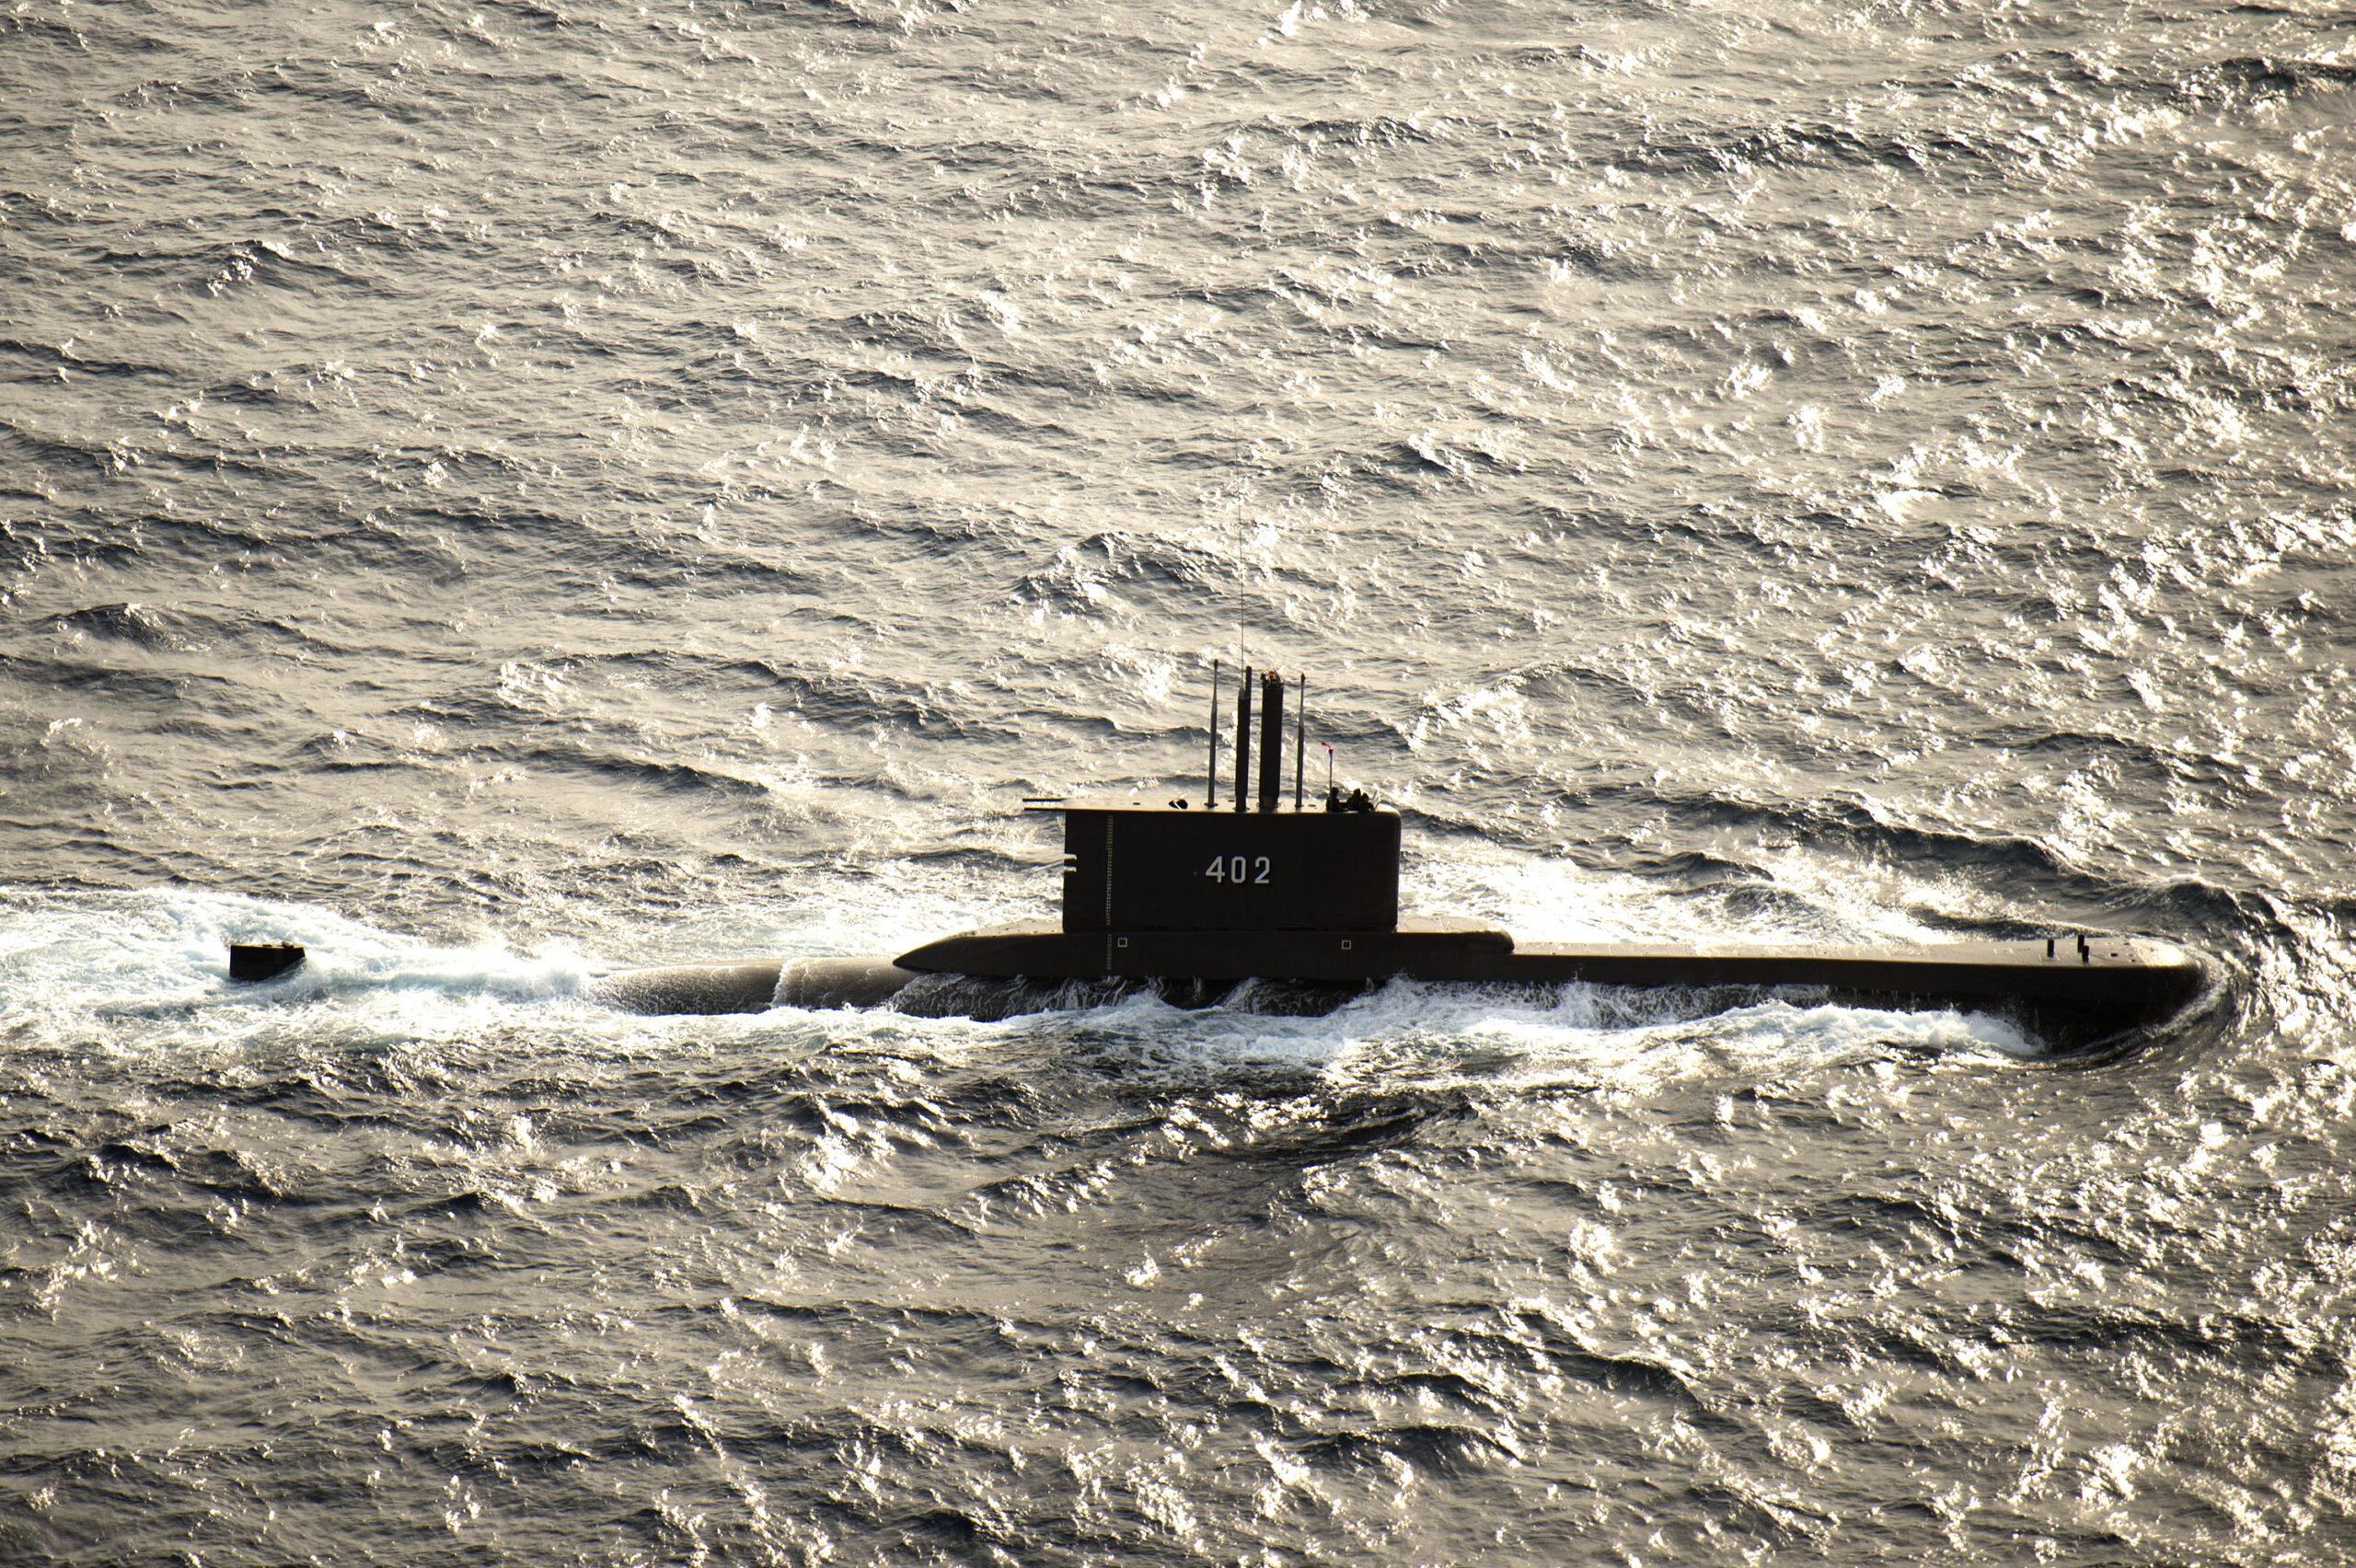 Indonesian submarine KRI Nanggala 402 underway in August 2015 scaled